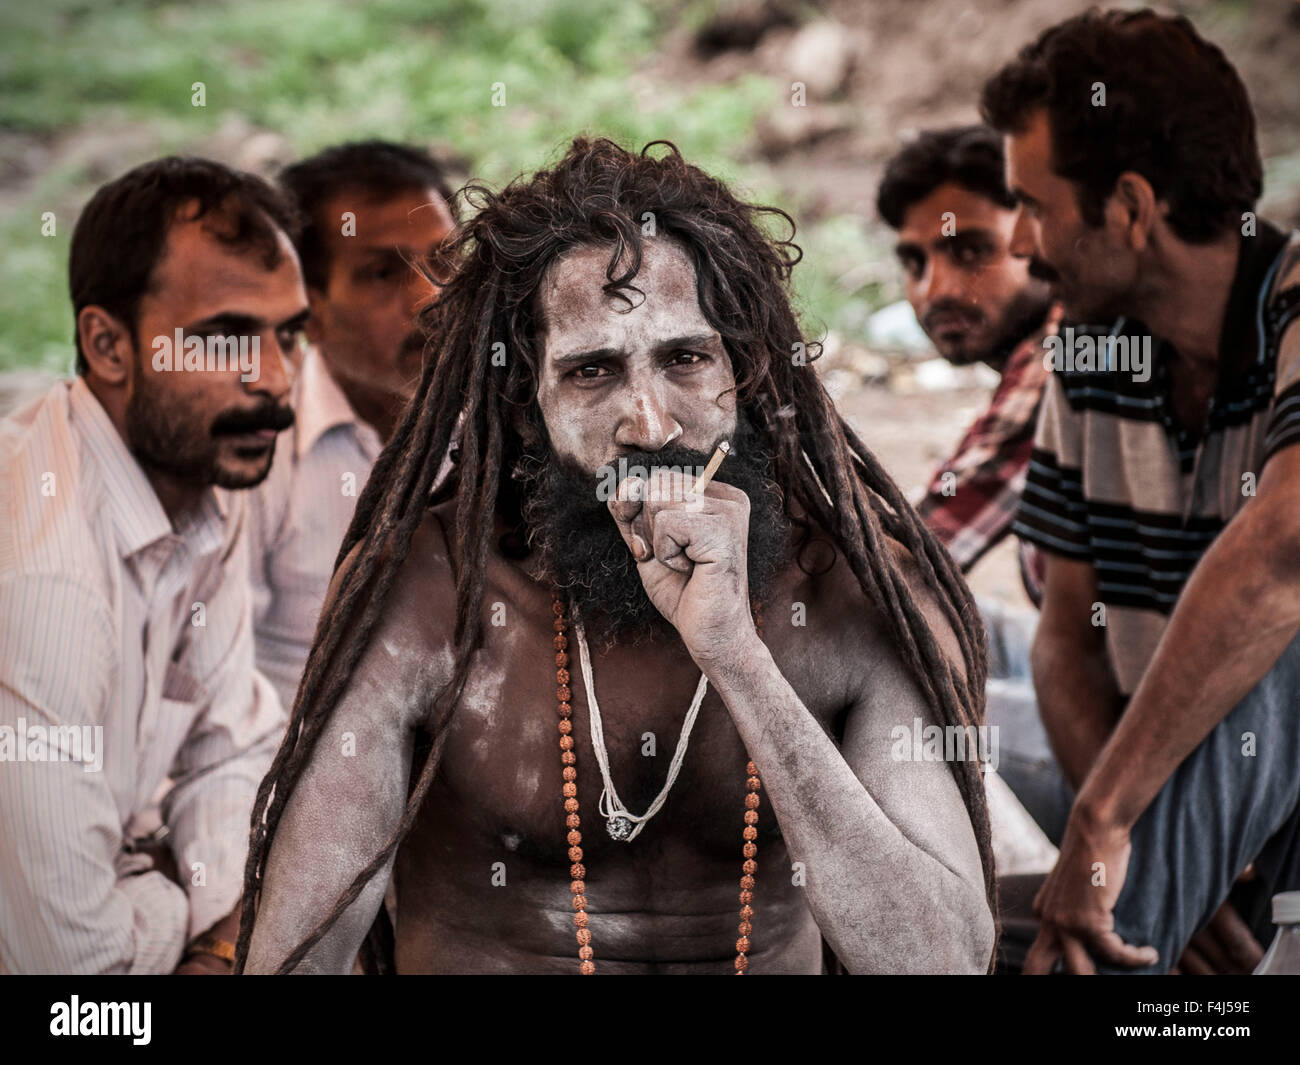 A Sadhu smoking at the Kumbh Mela - Stock Image